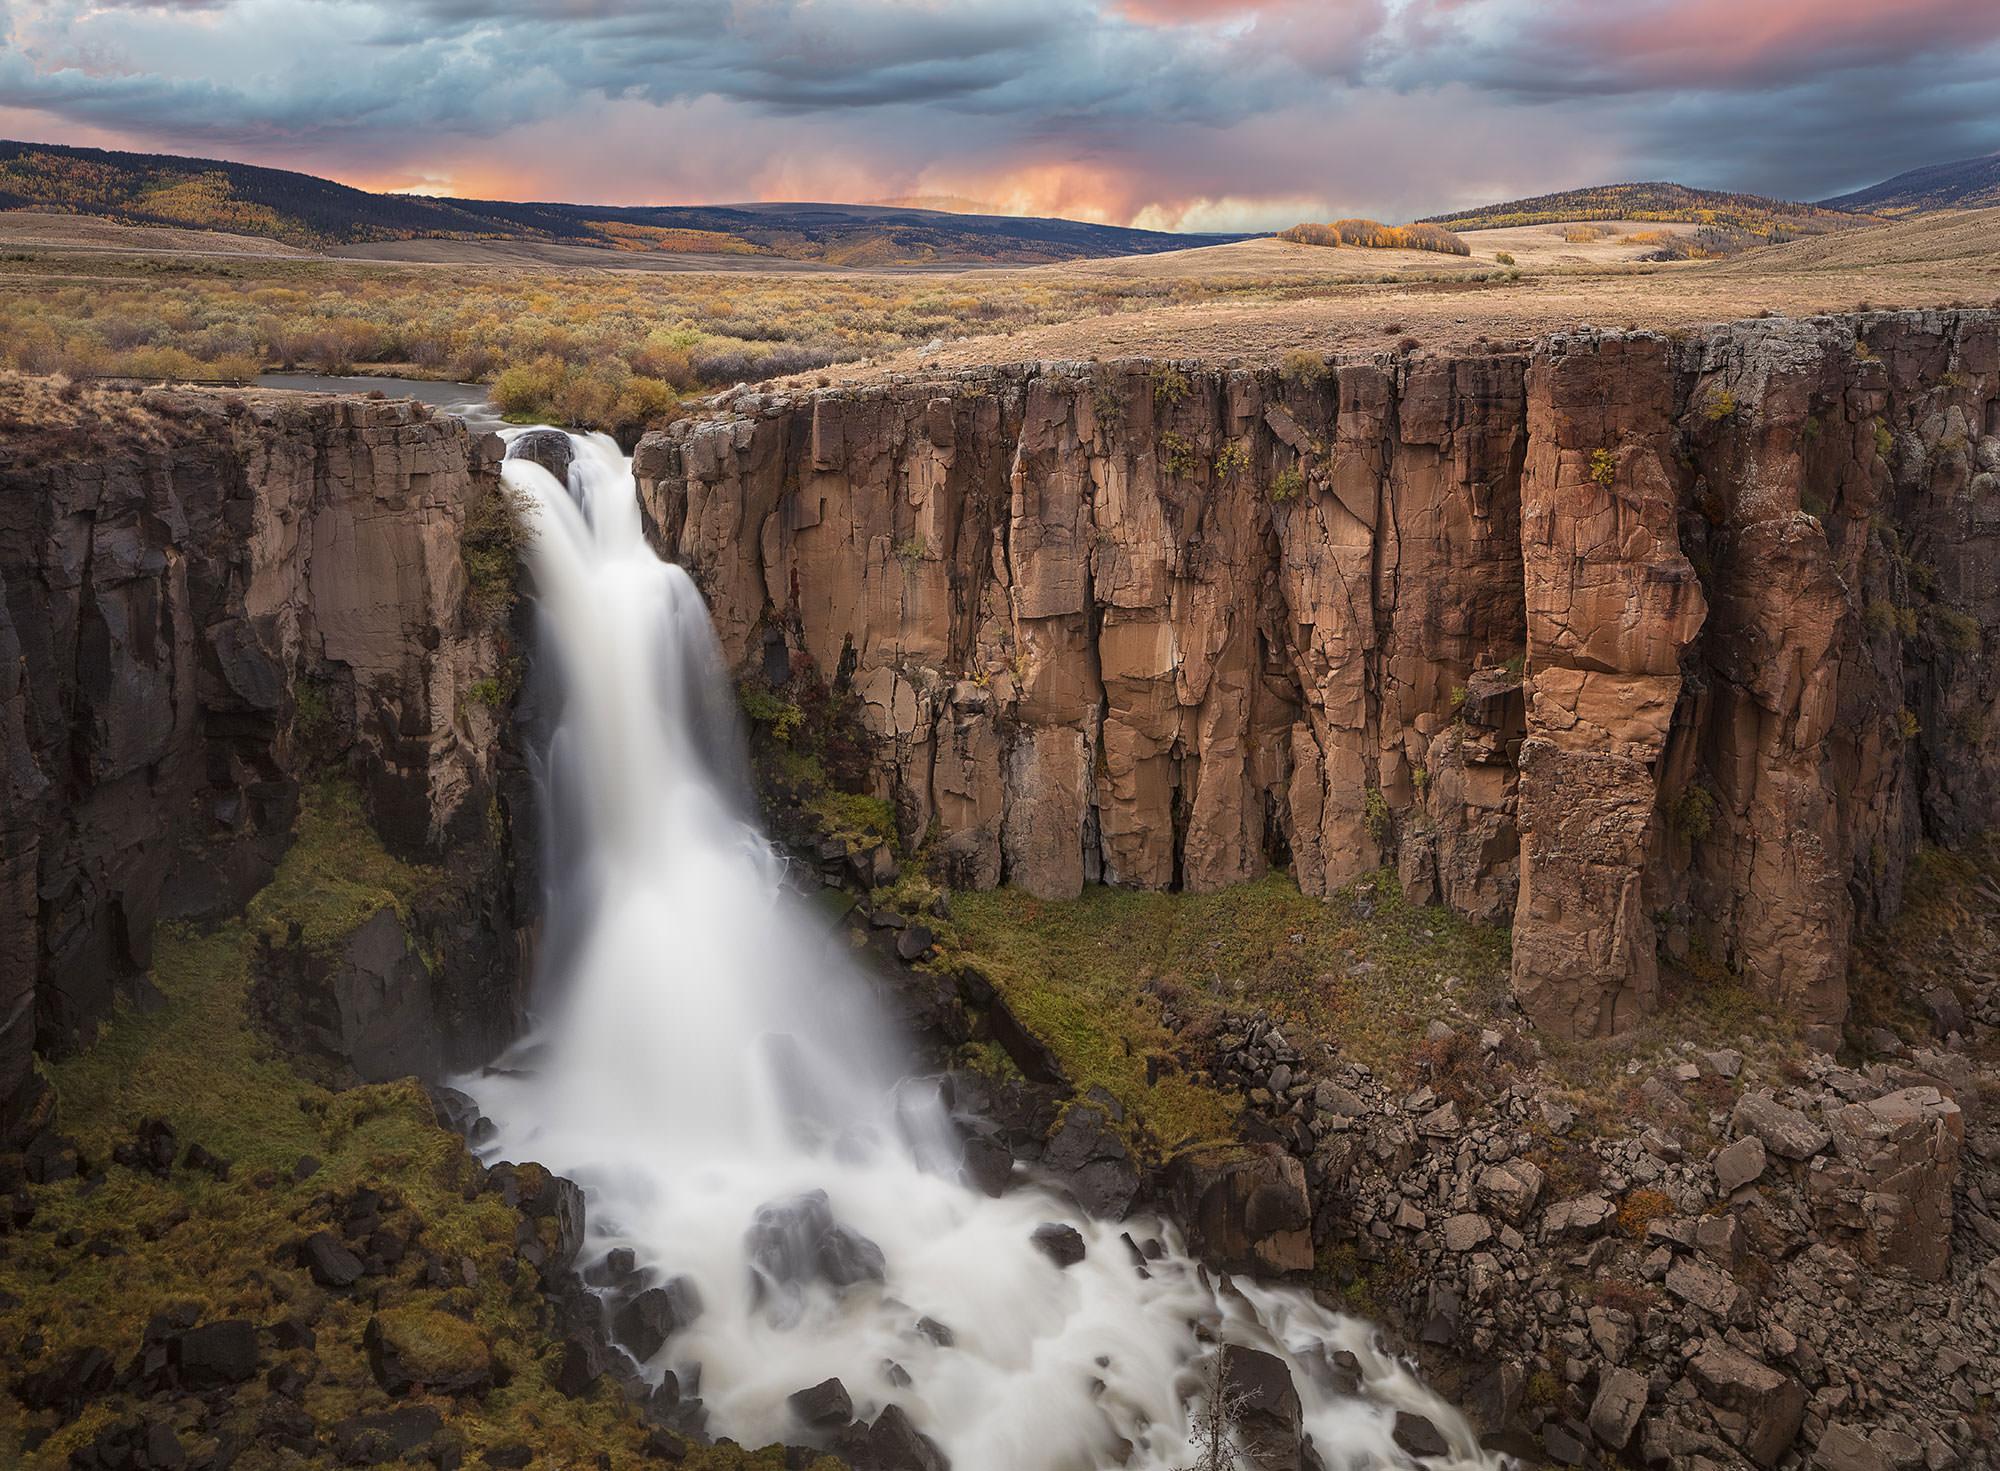 North creek falls - Near Lake City, CO